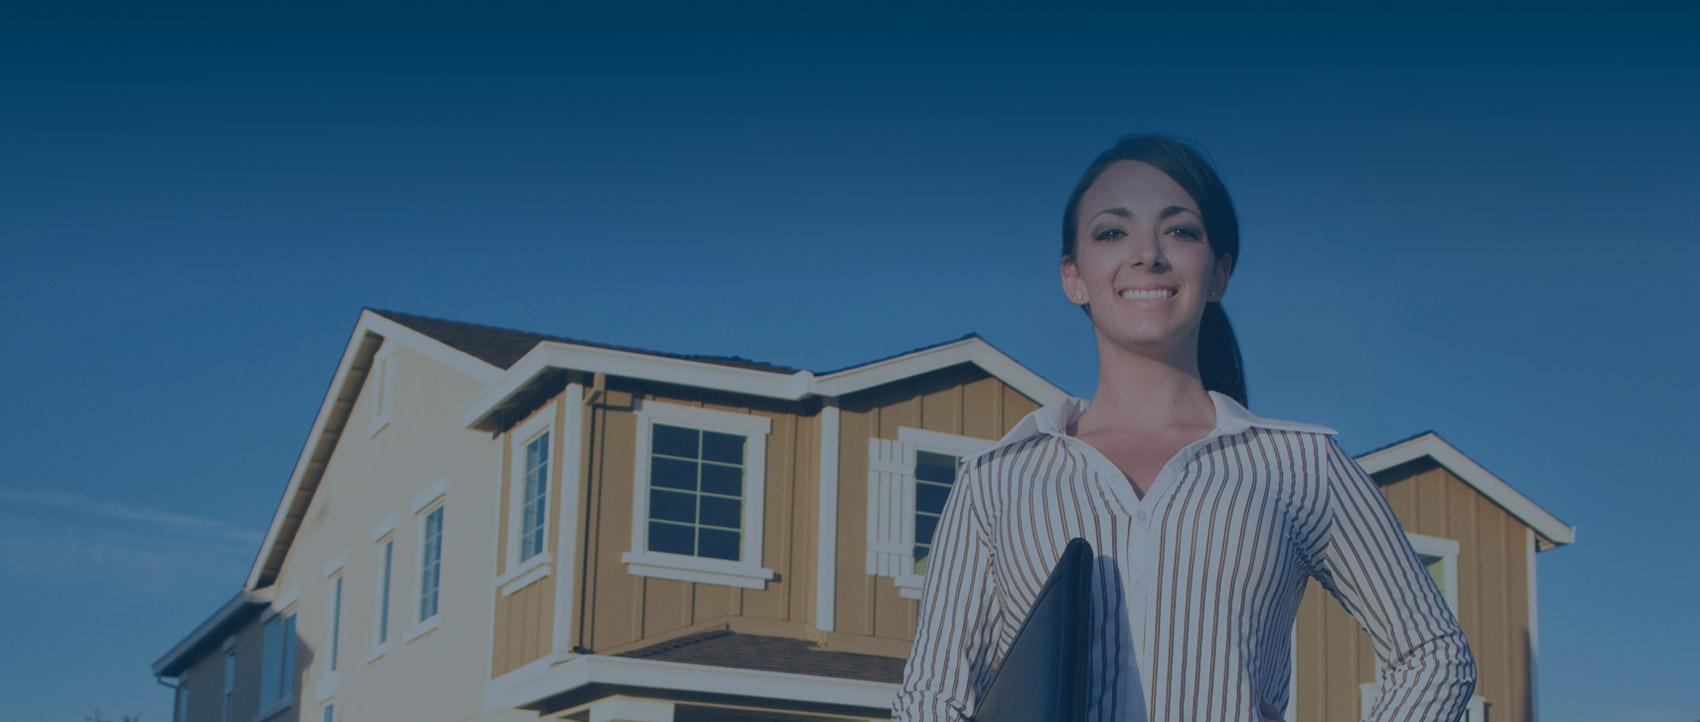 Home Inspection Tacoma